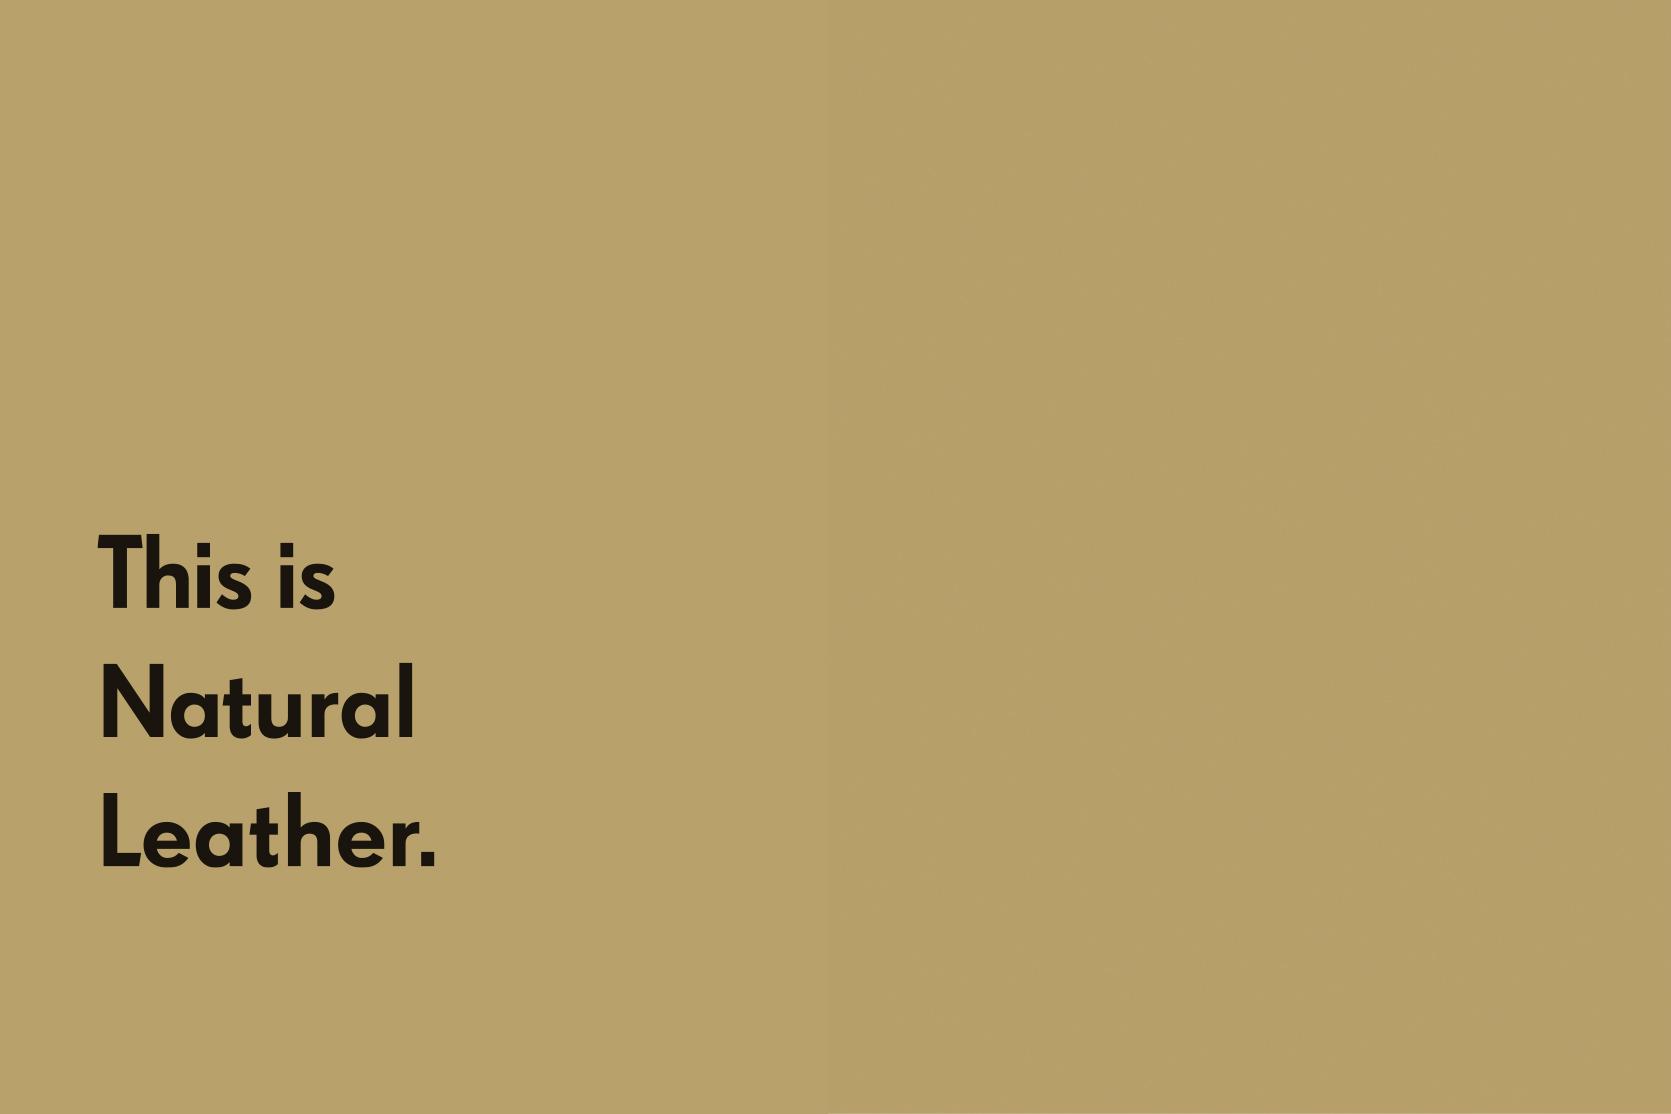 Julia-Kostreva-Studio-Branding-Joshu-Vela--Typography-Sample-Campaign-This-is-Natural-Leather.jpg